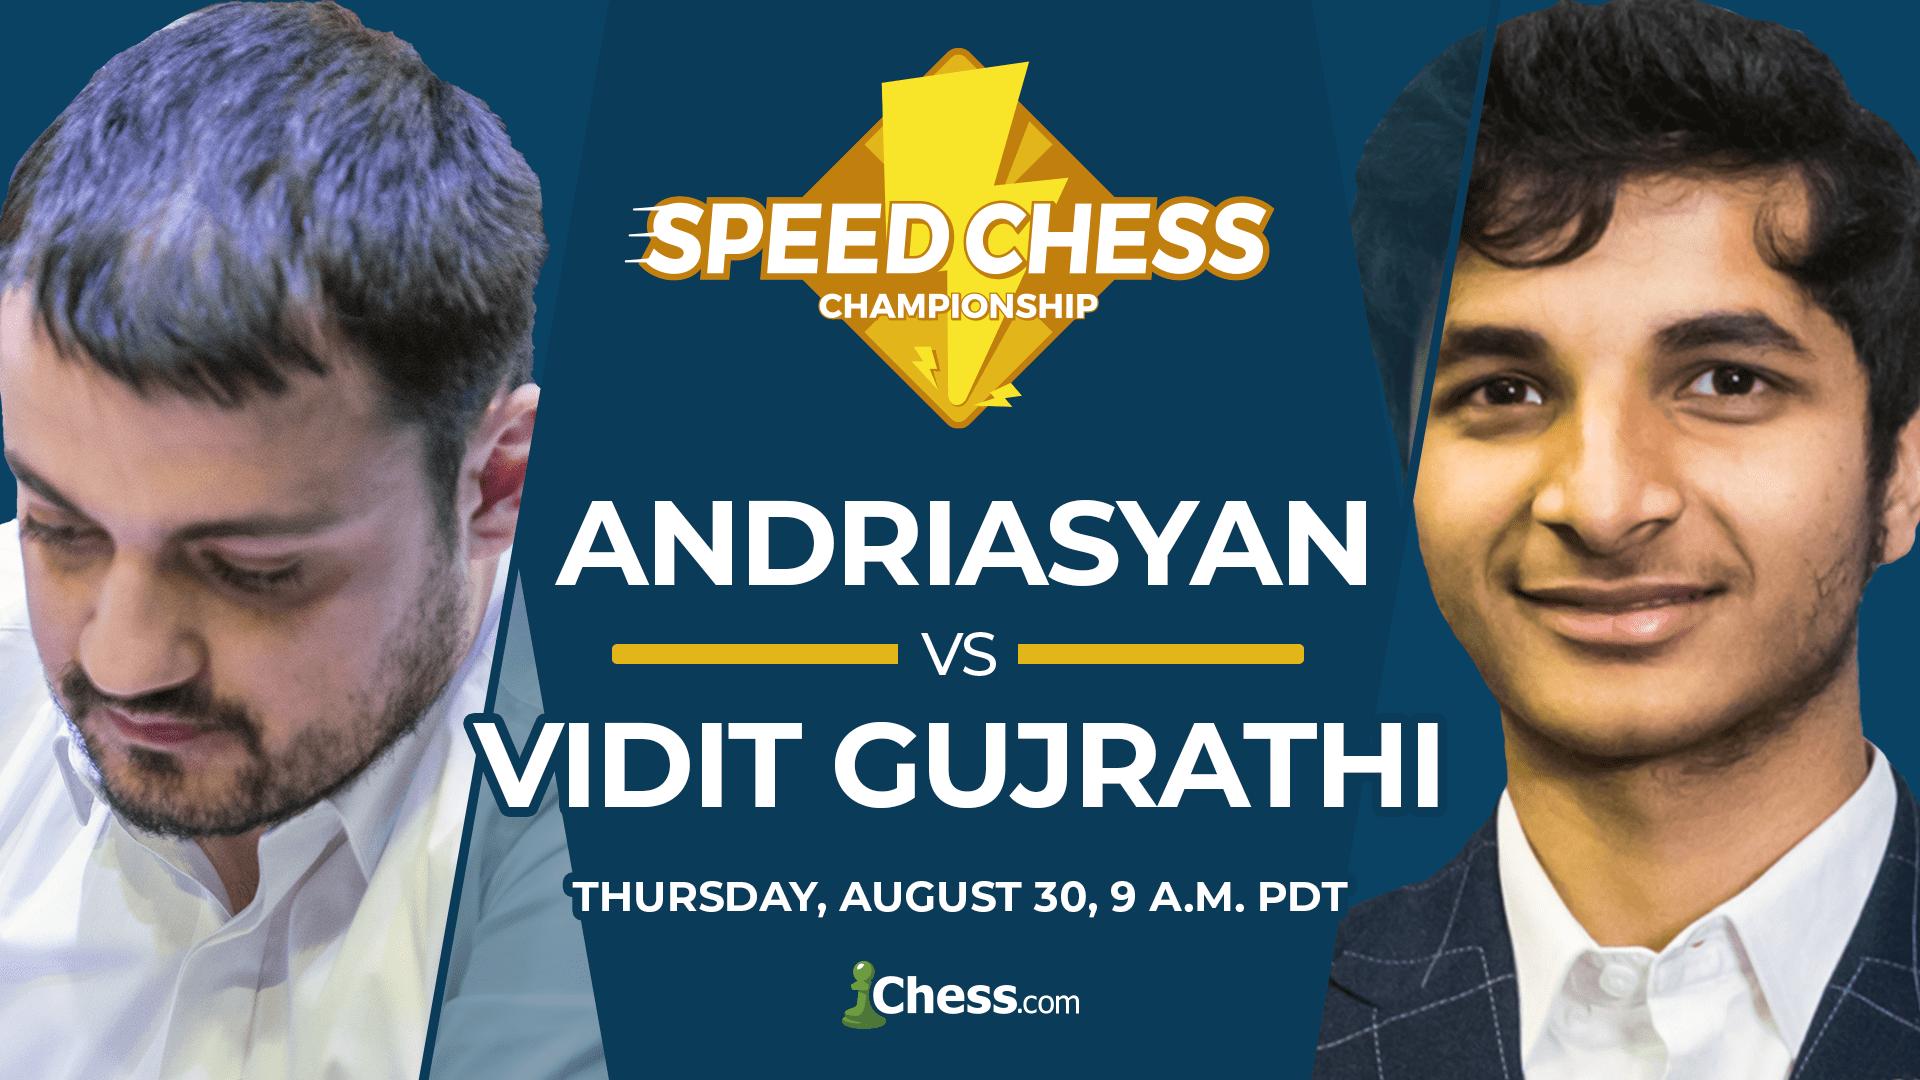 Andriasyan vs Vidit Gujrathi:Thursday, August 30, 9 a.m. PDT